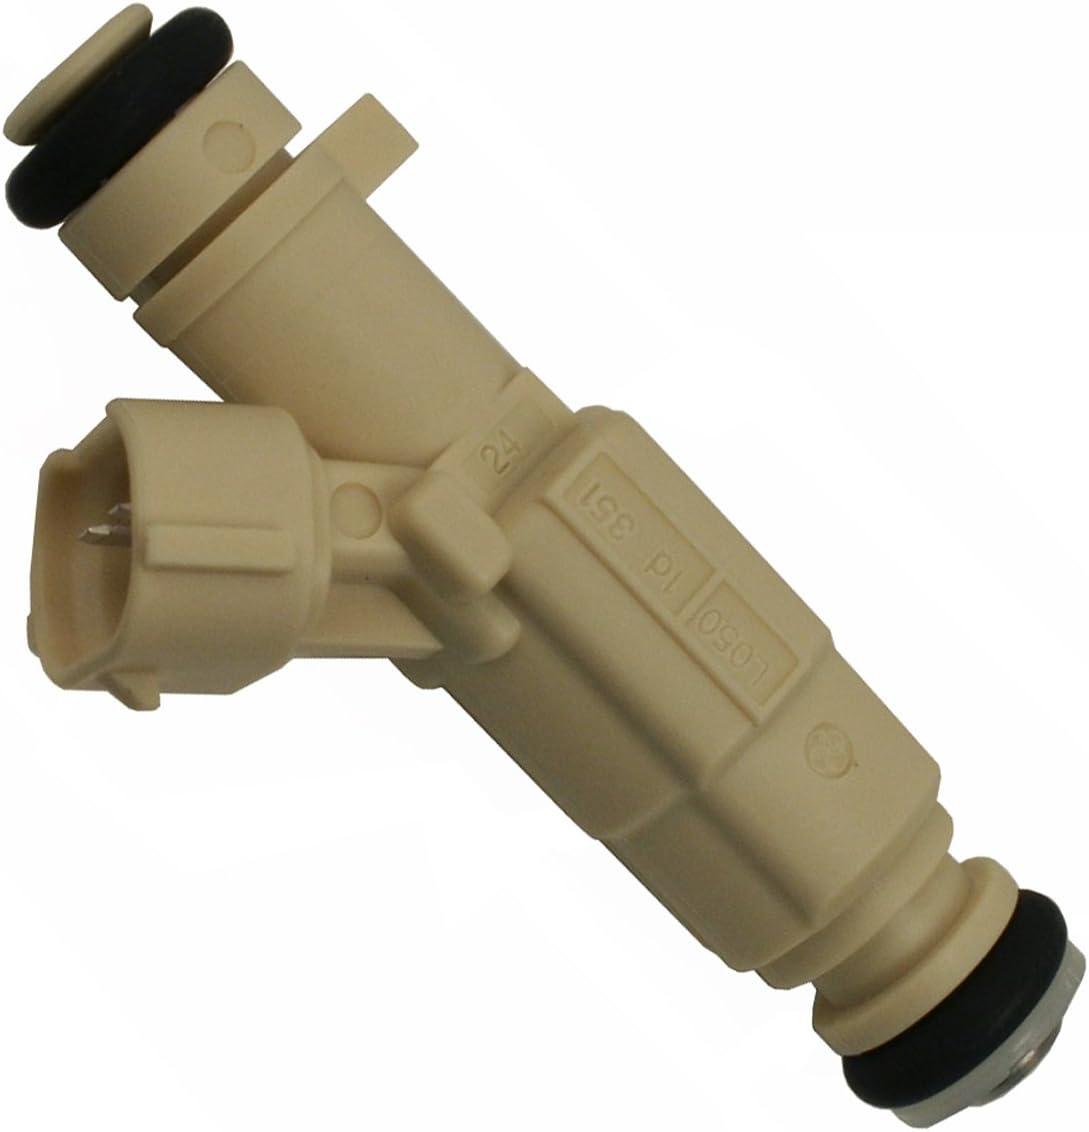 Beck Arnley 158-1464 New Fuel Injector